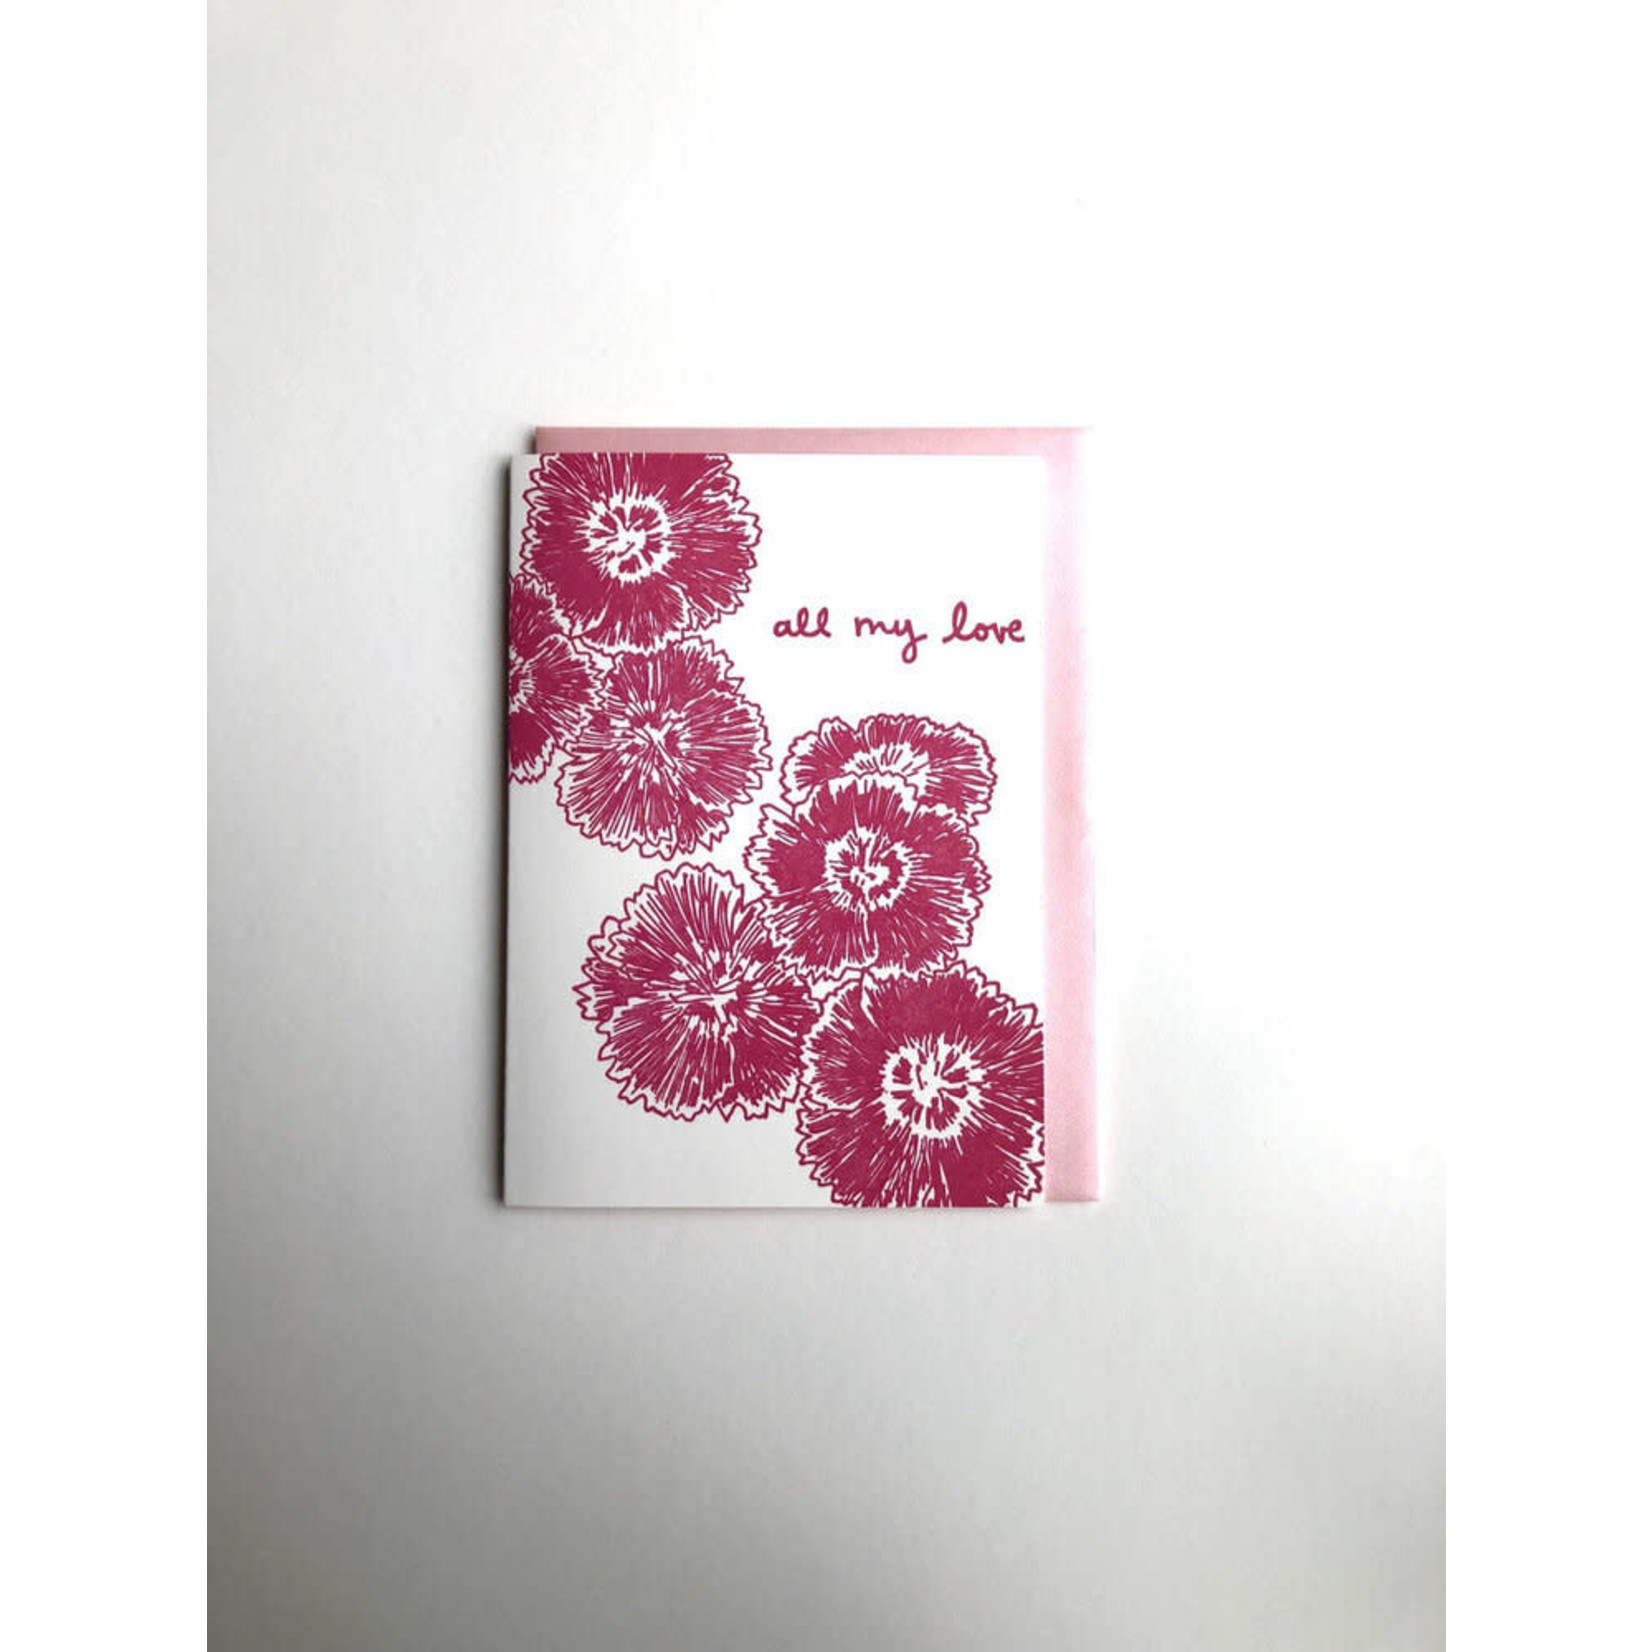 Macon York Press Dianthus All My Love Card